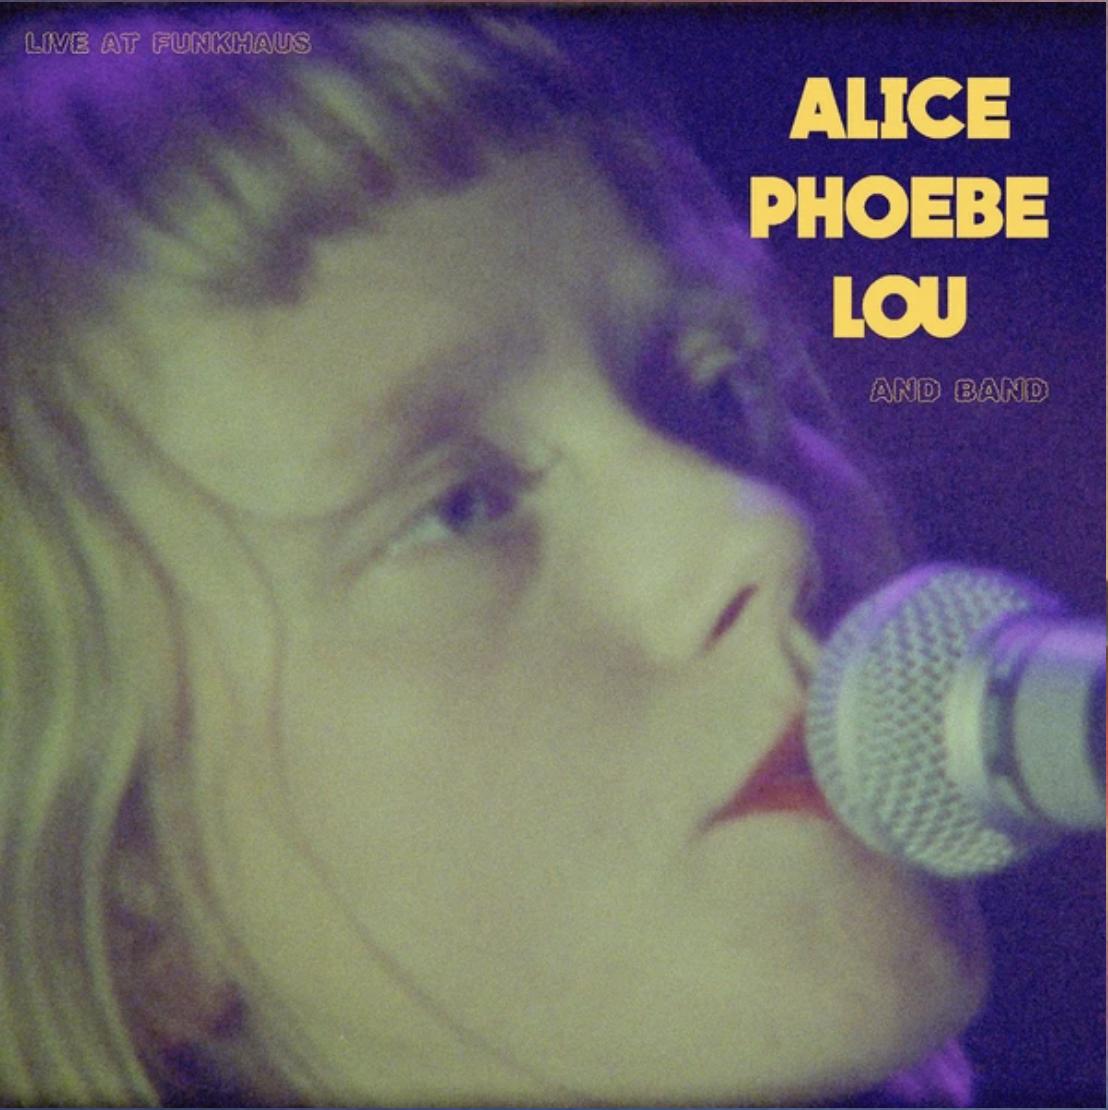 Alice Phobe Lou live album